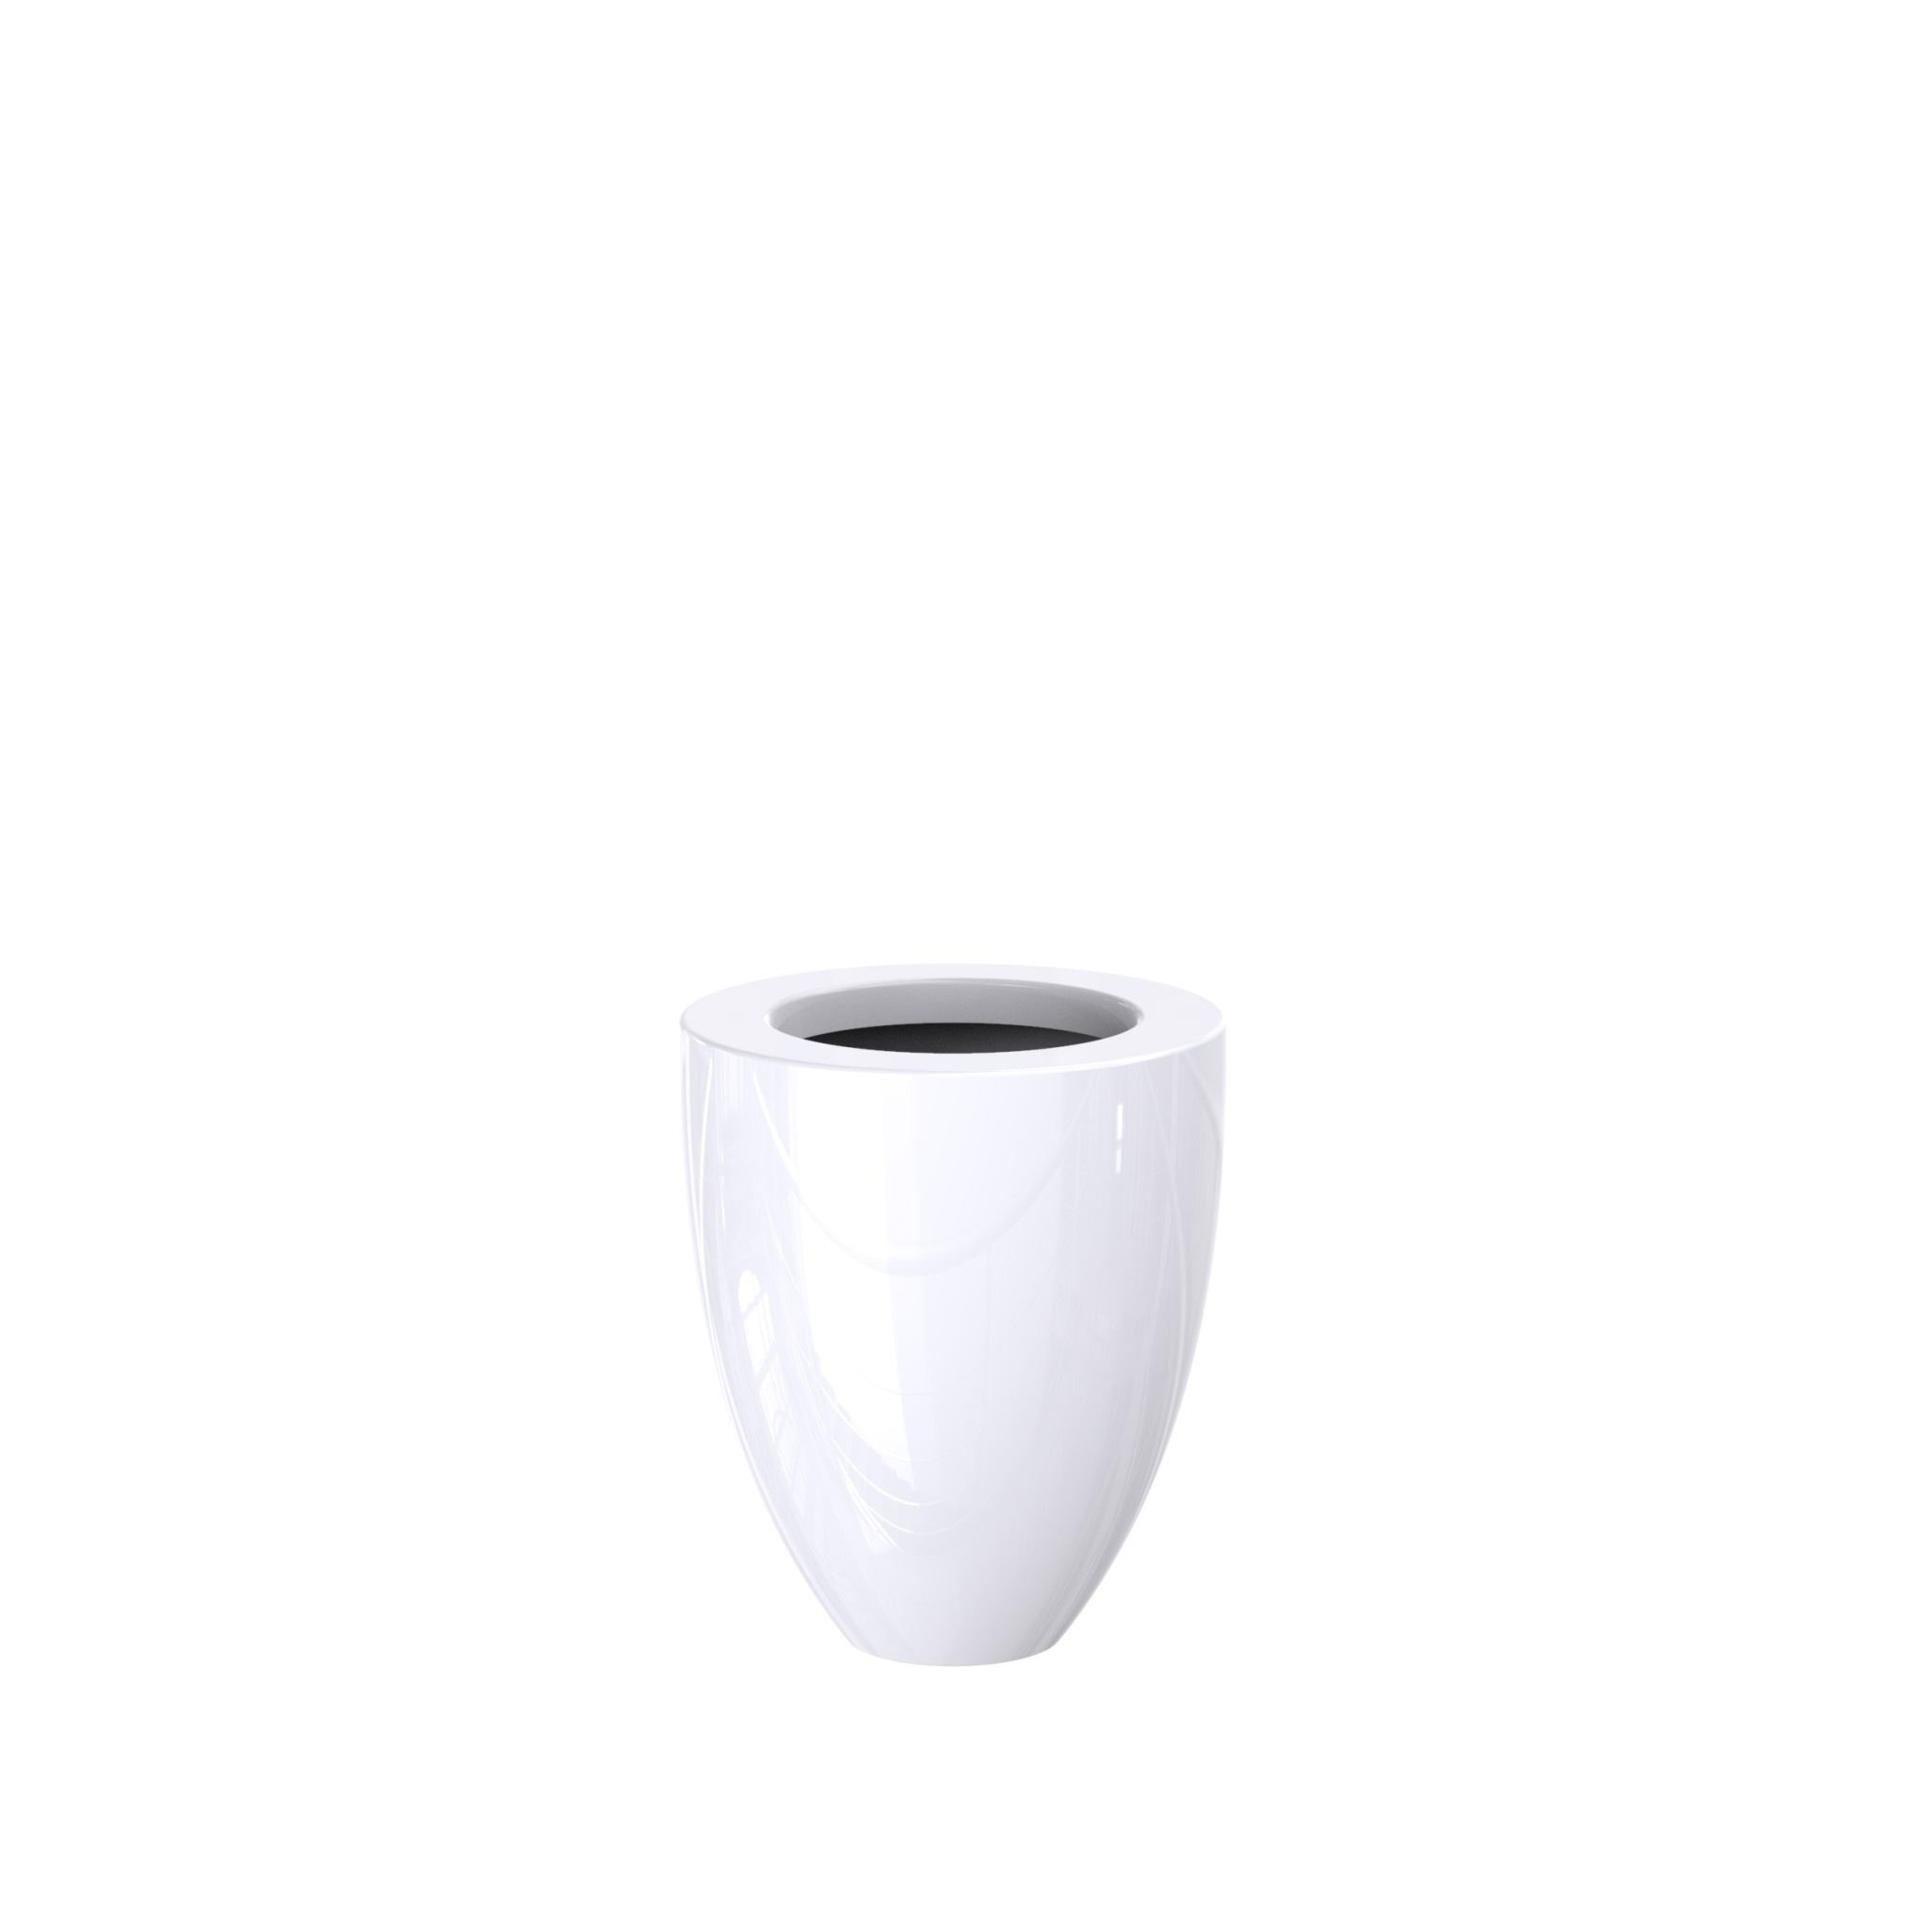 Adezz Producten Pot  Canna  Adezz polyester hoogglans  in 5 maten